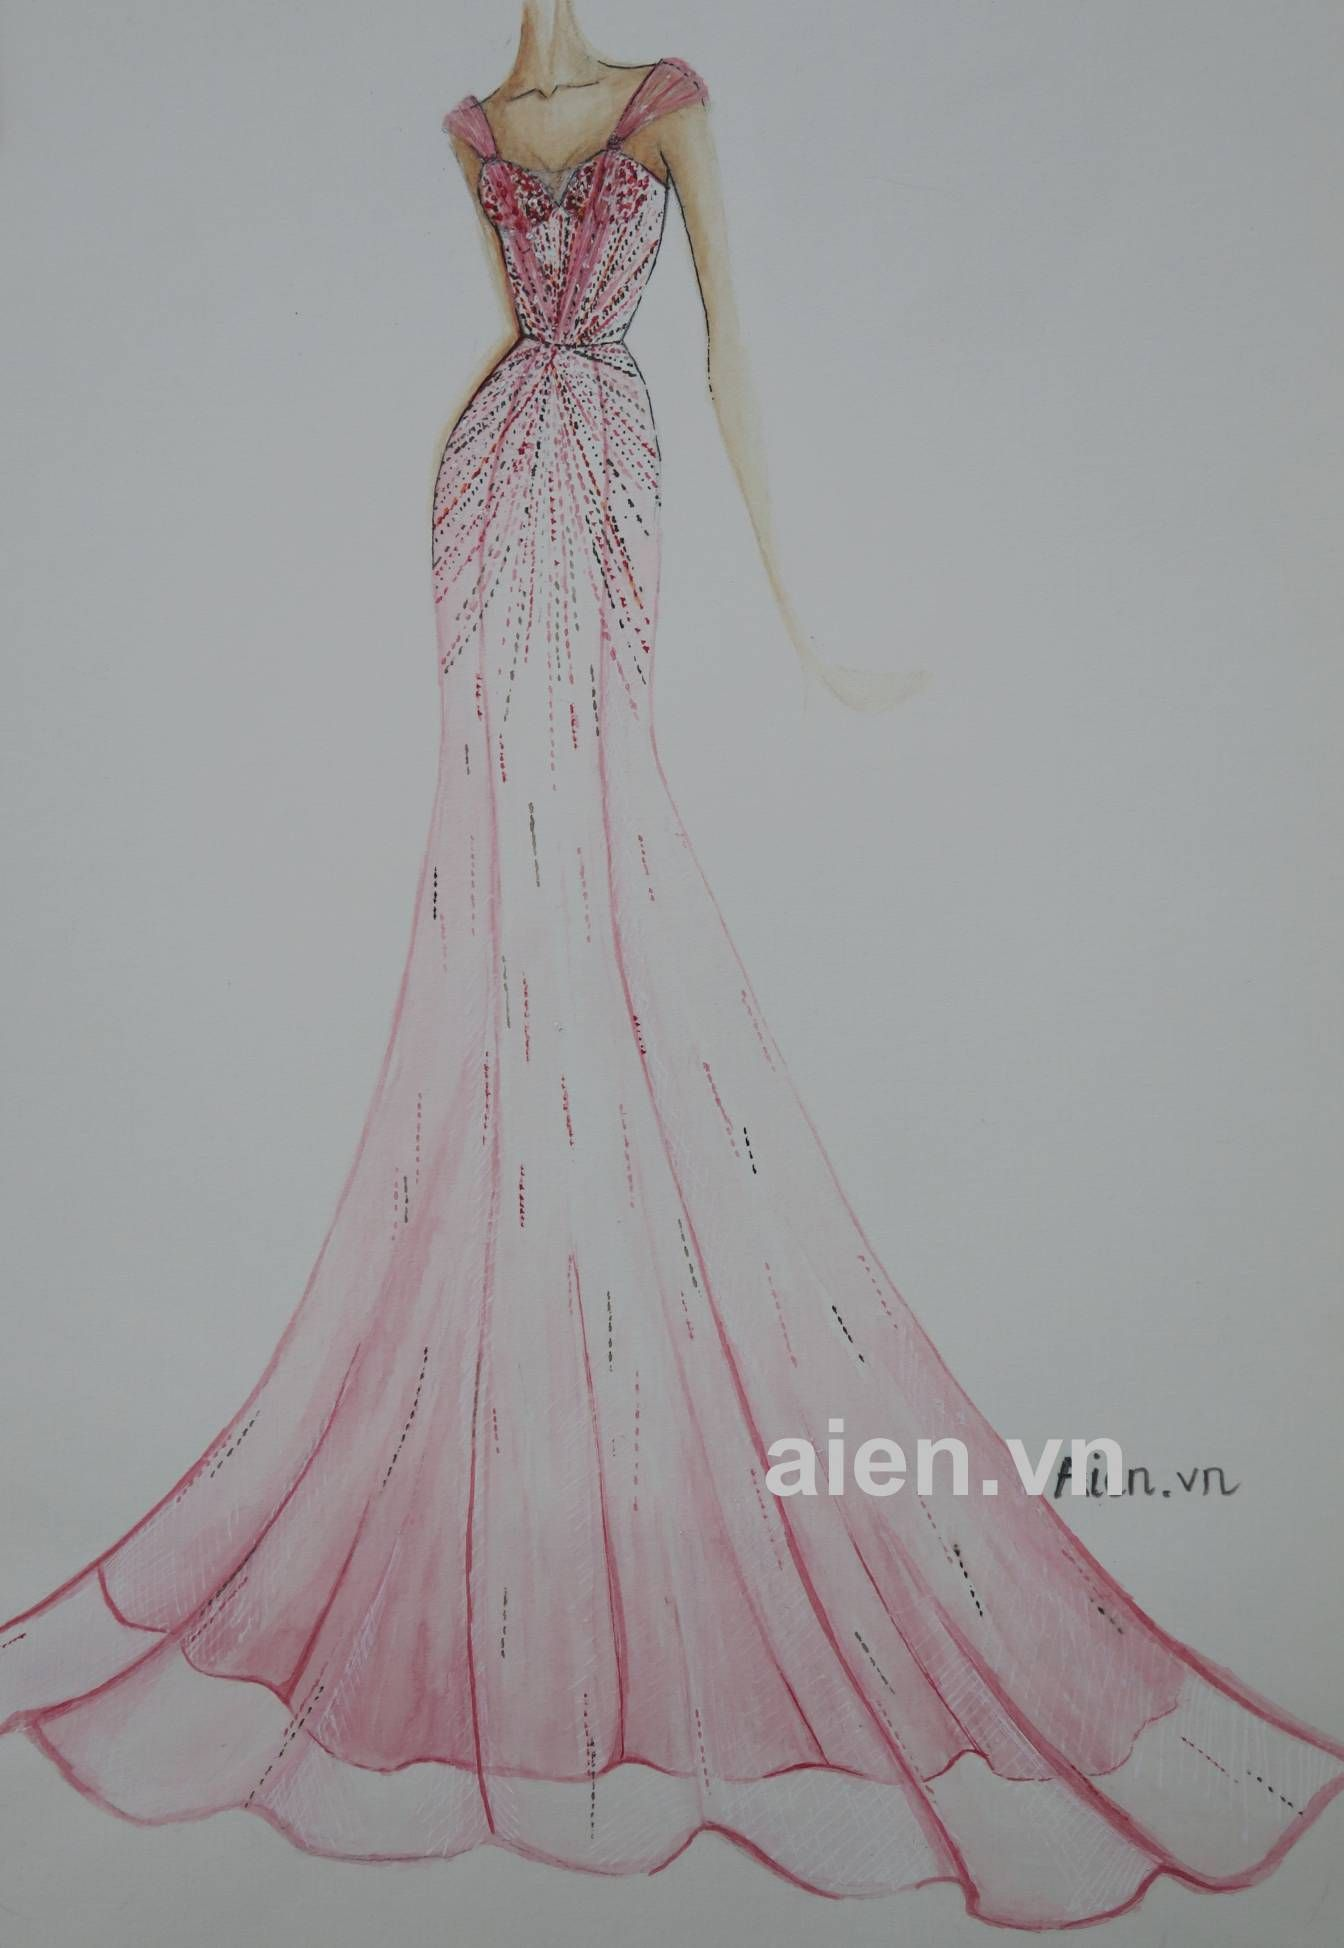 Pink dress drawing  Mẫu phác thảo A  fashion drawing  Pinterest  Fashion